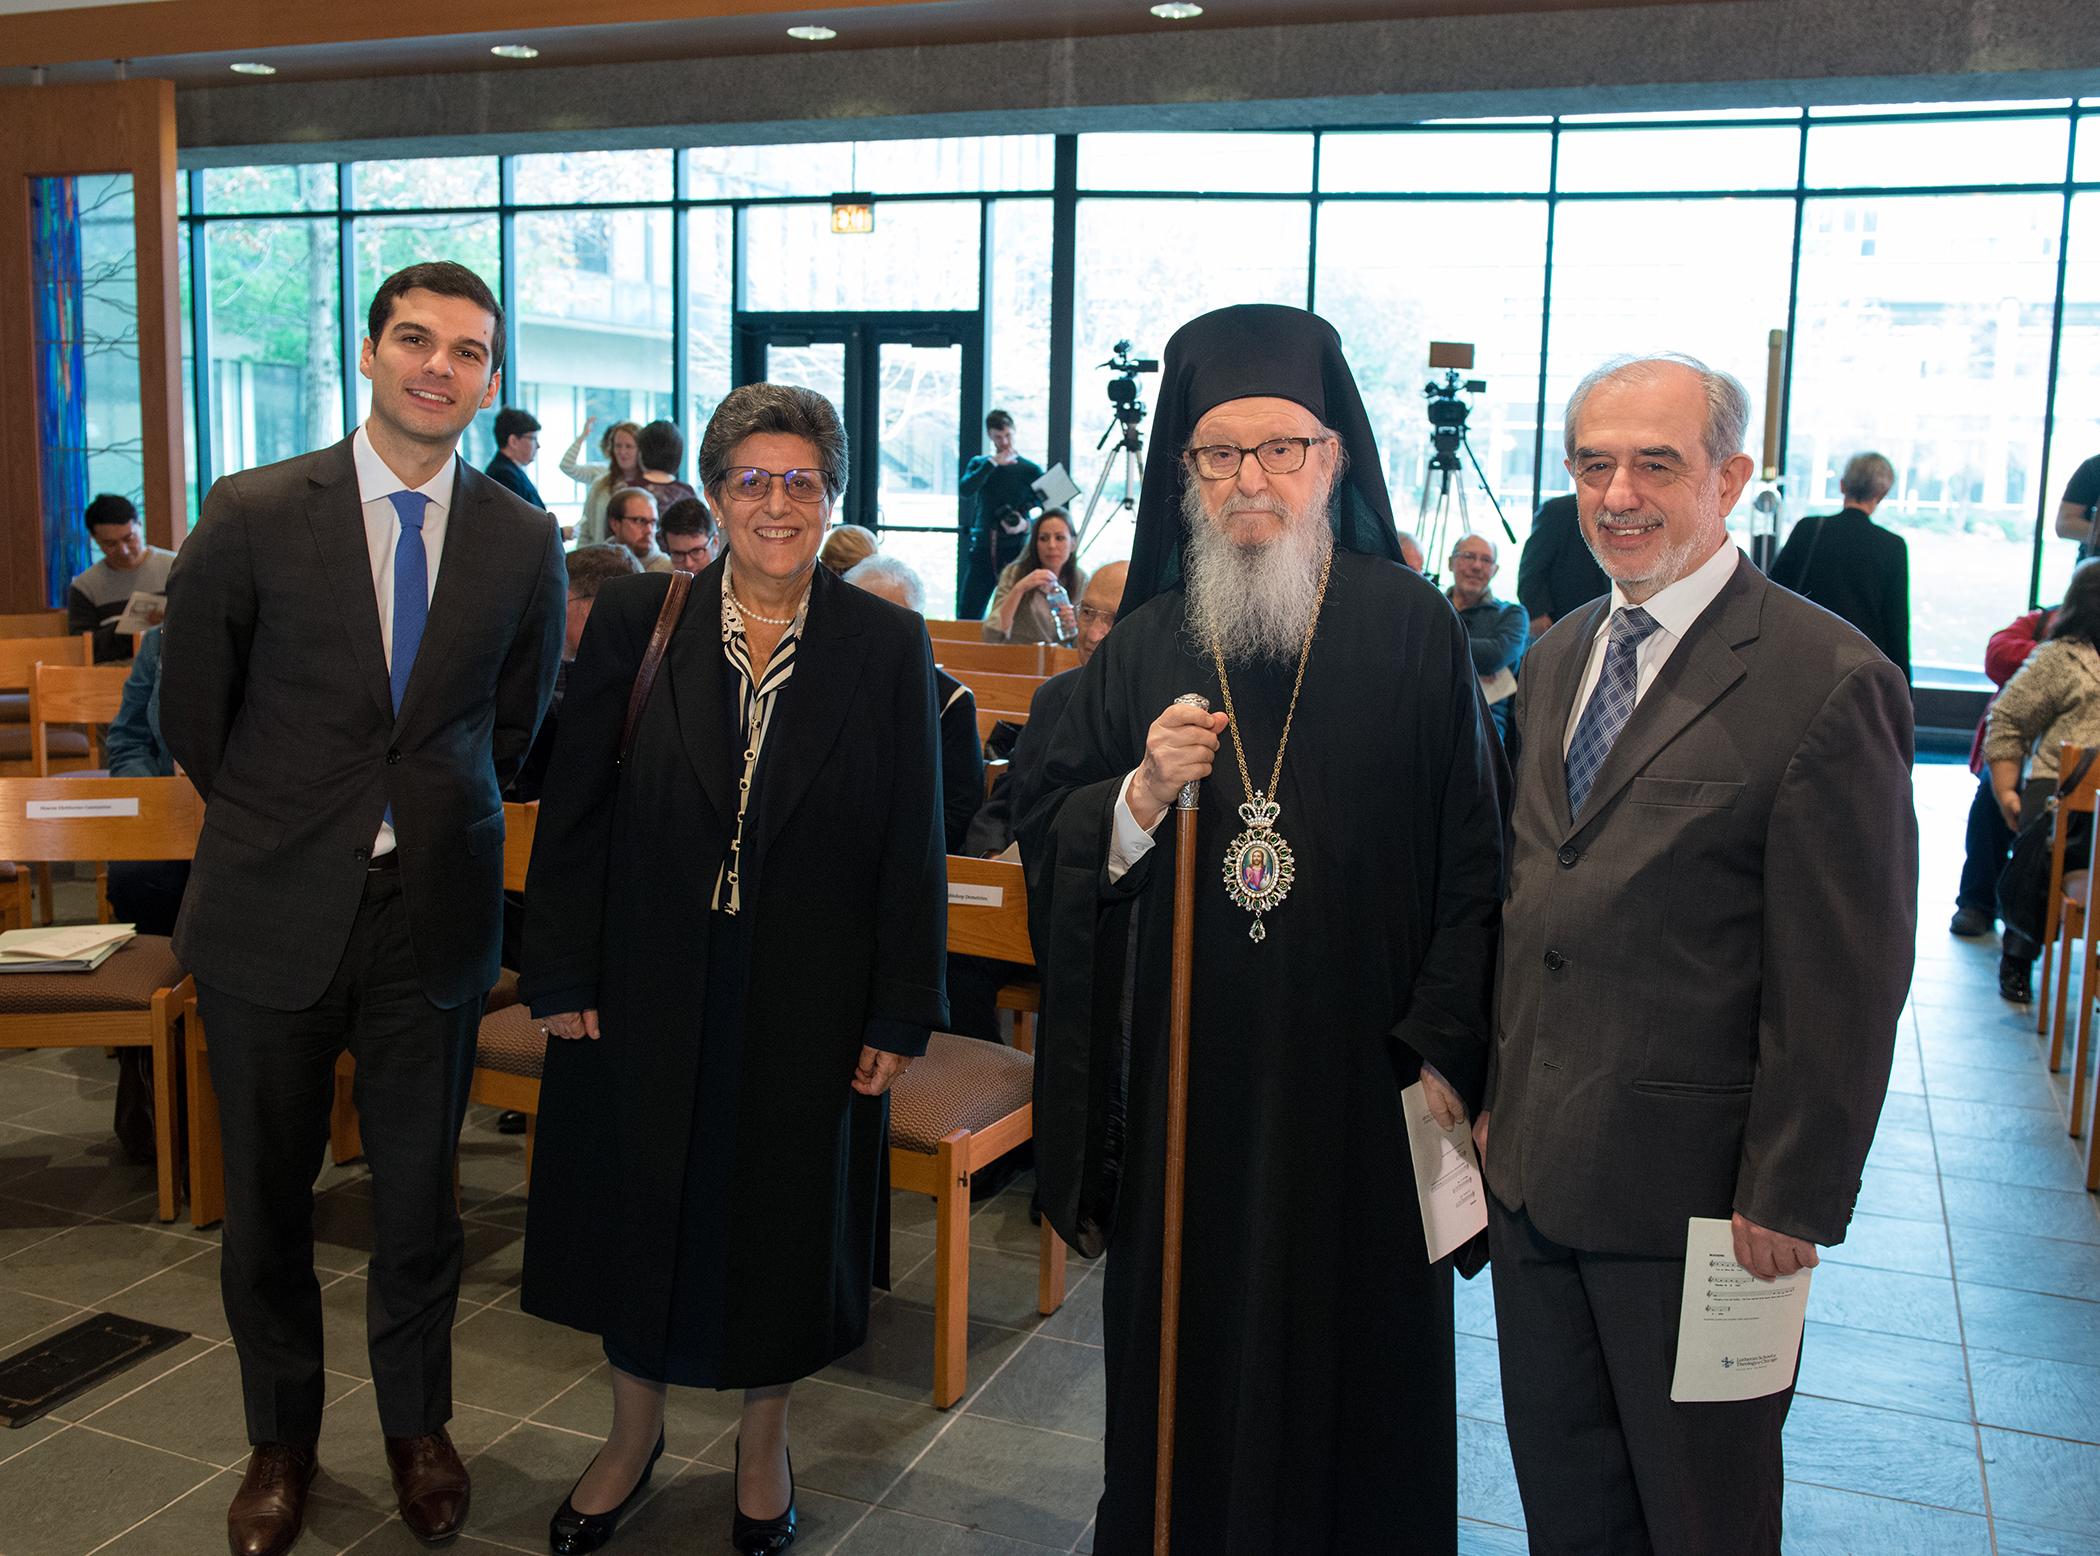 Archbishop-Chicago-Greek-Orthodox-guests-LSTCRareNT116.jpg